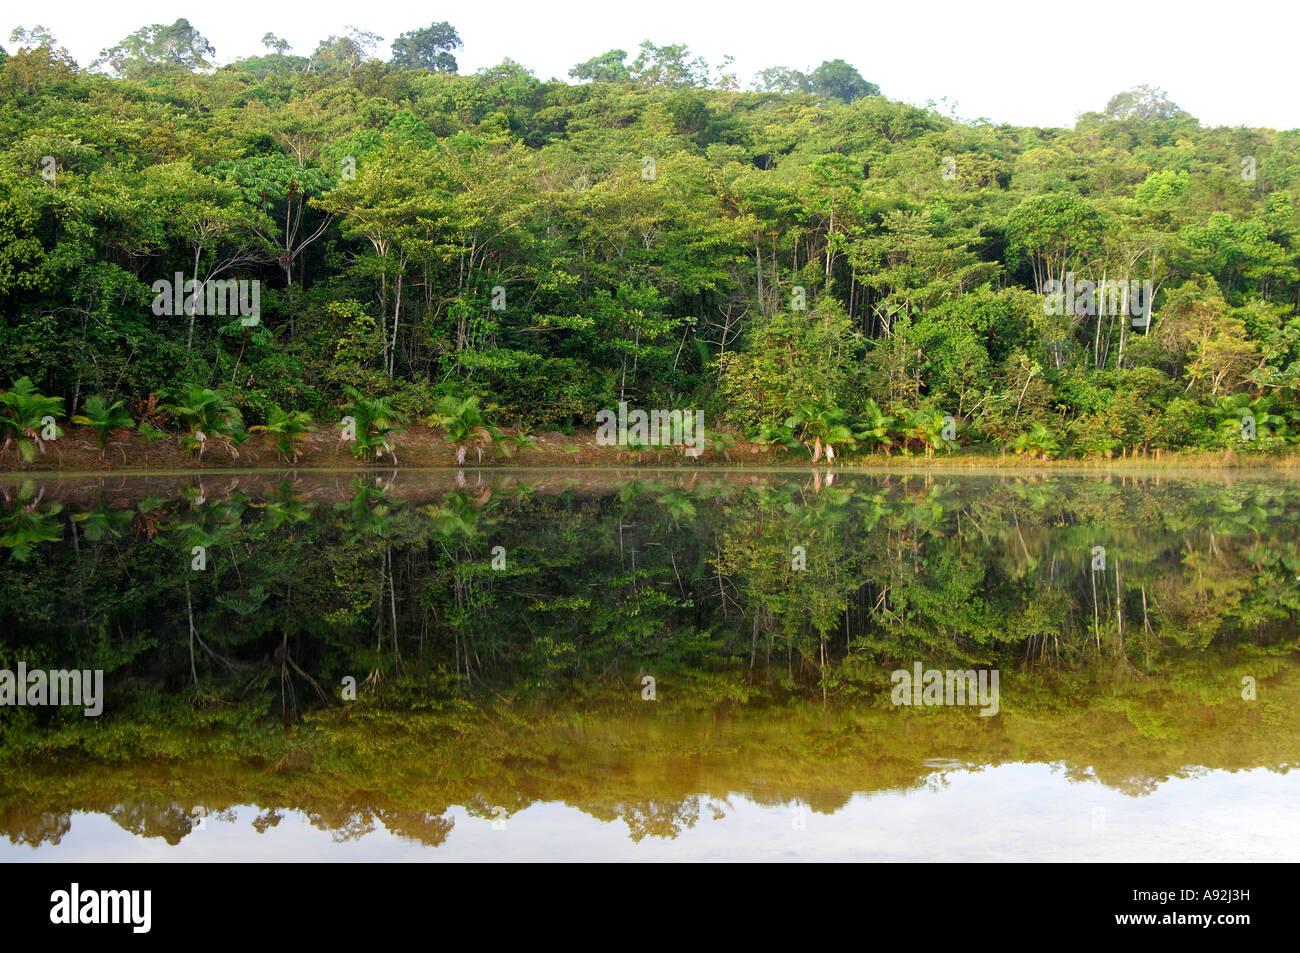 Lake in the tropical rainforest, Amazon region, Brazil - Stock Image